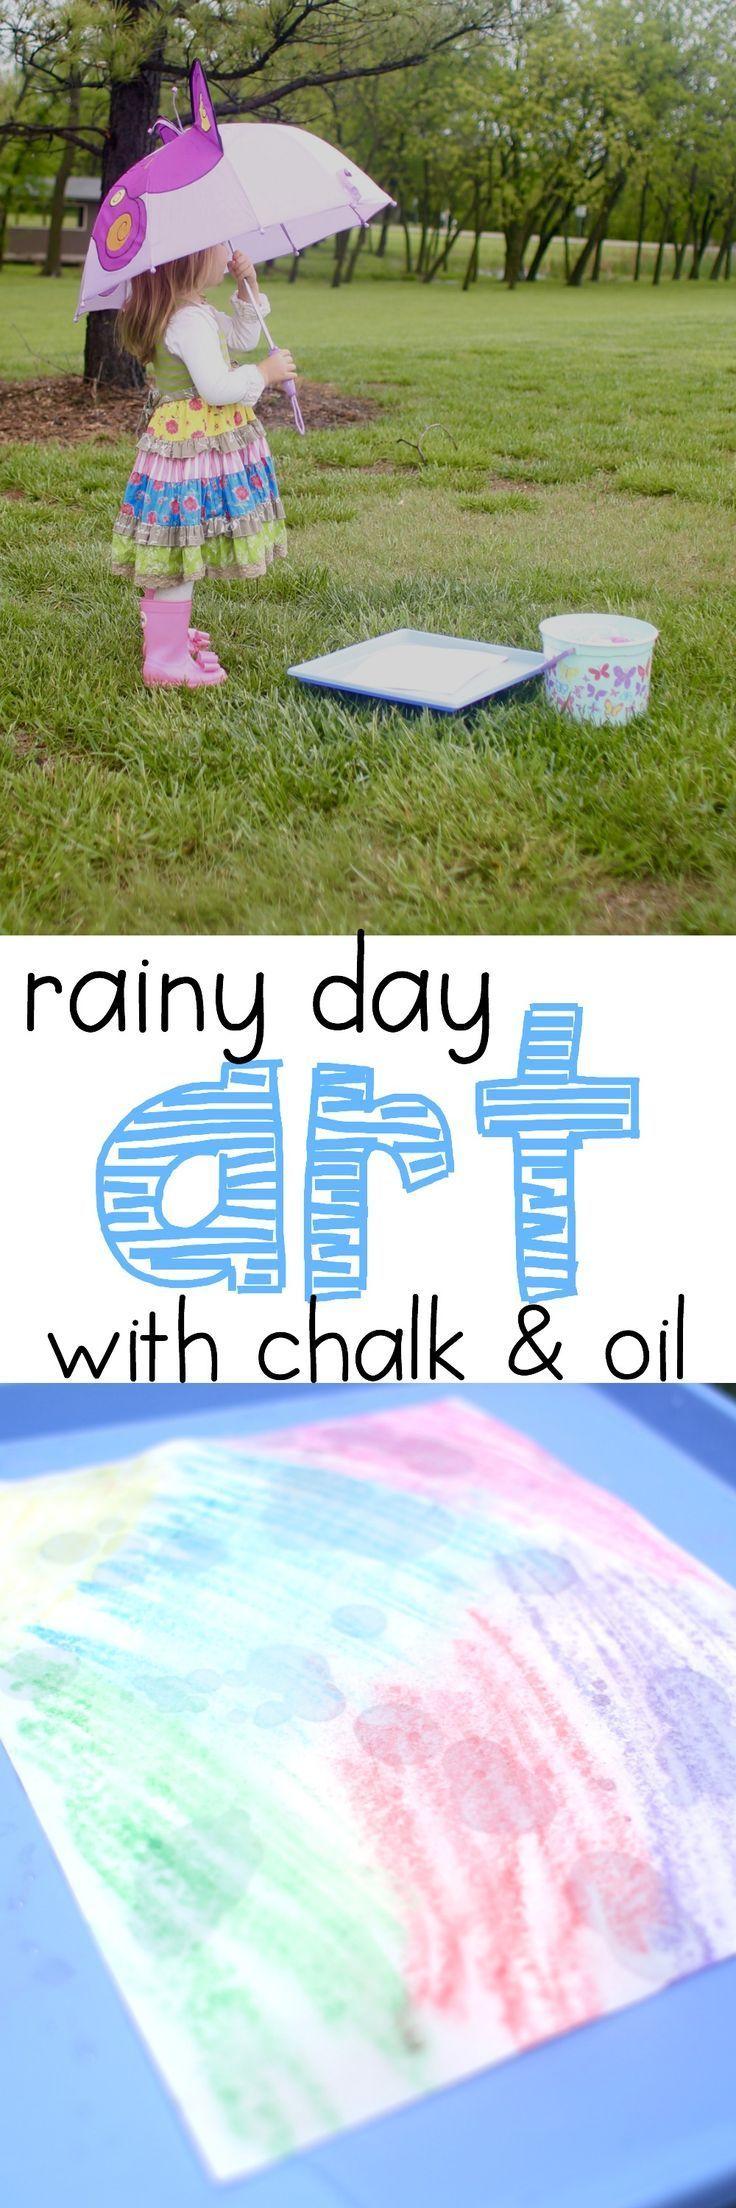 683 best Rainy Day Fun images on Pinterest | Babys, Fun activities ...